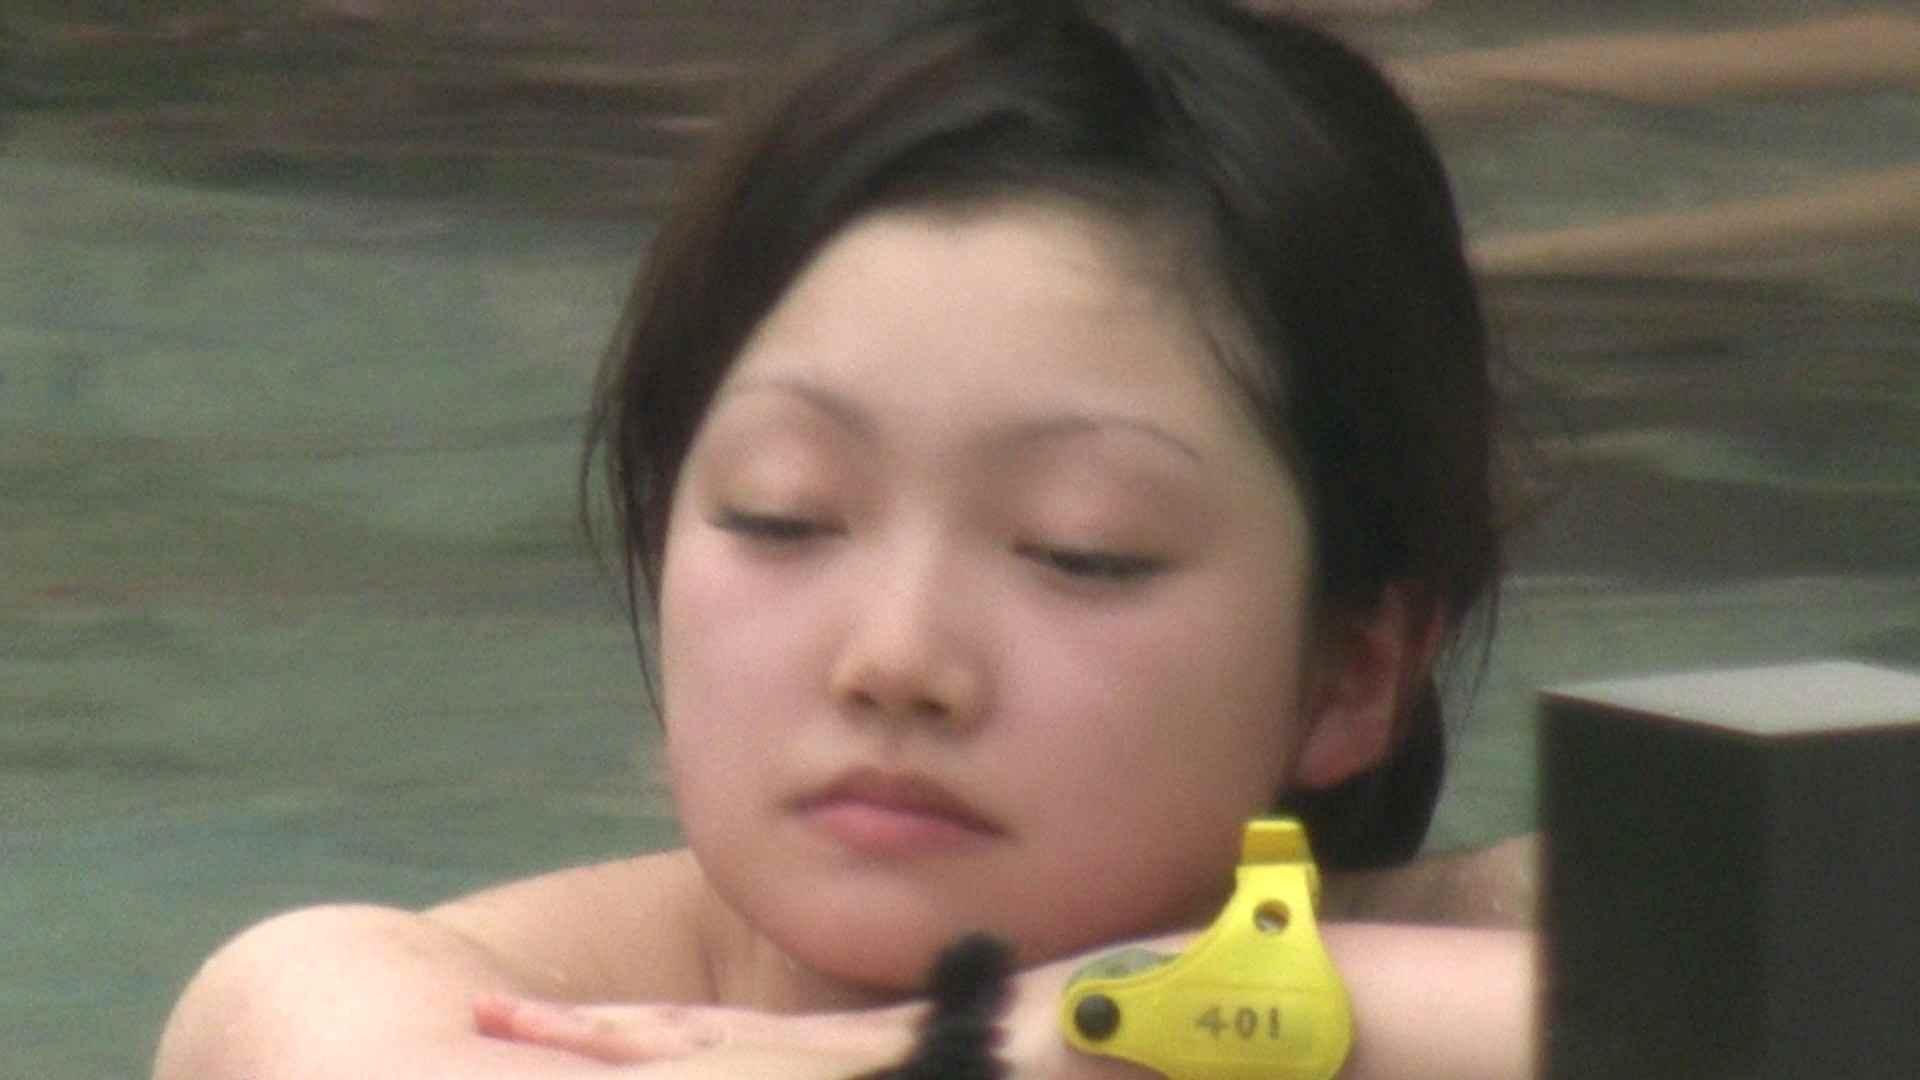 Aquaな露天風呂Vol.126 盗撮シリーズ | 露天風呂編  103PIX 37